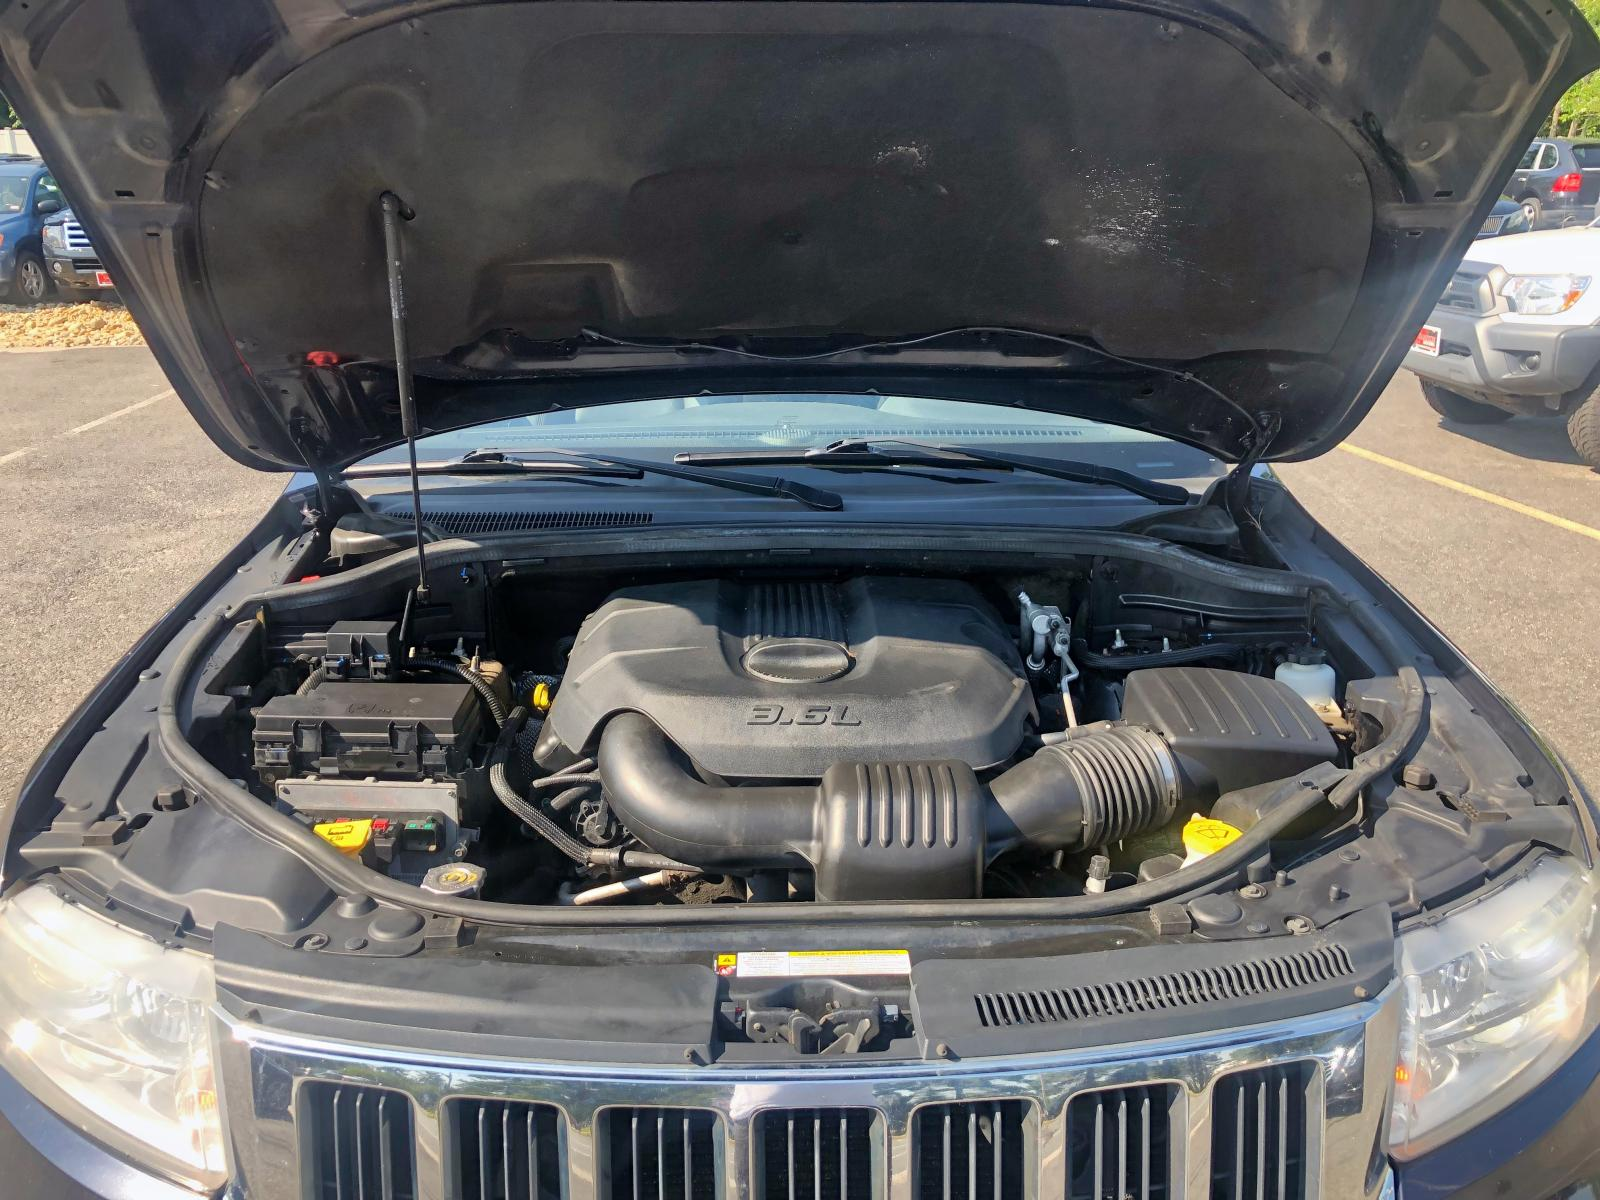 1J4RR5GG0BC656093 - 2011 Jeep Grand Cher 3.6L front view